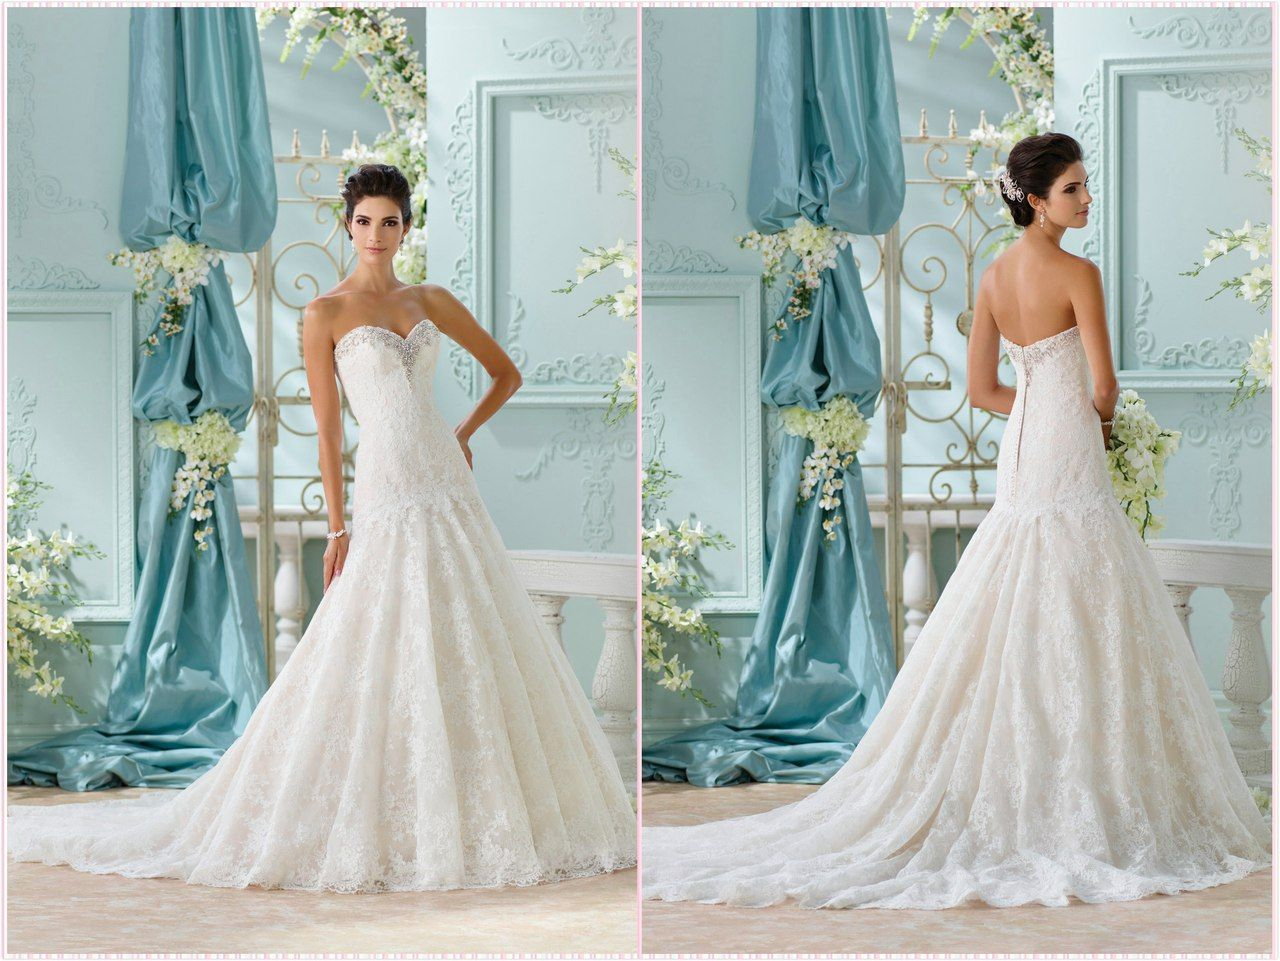 Aline wedding dresses   112 photos   Aline Wedding dresses   Pinterest